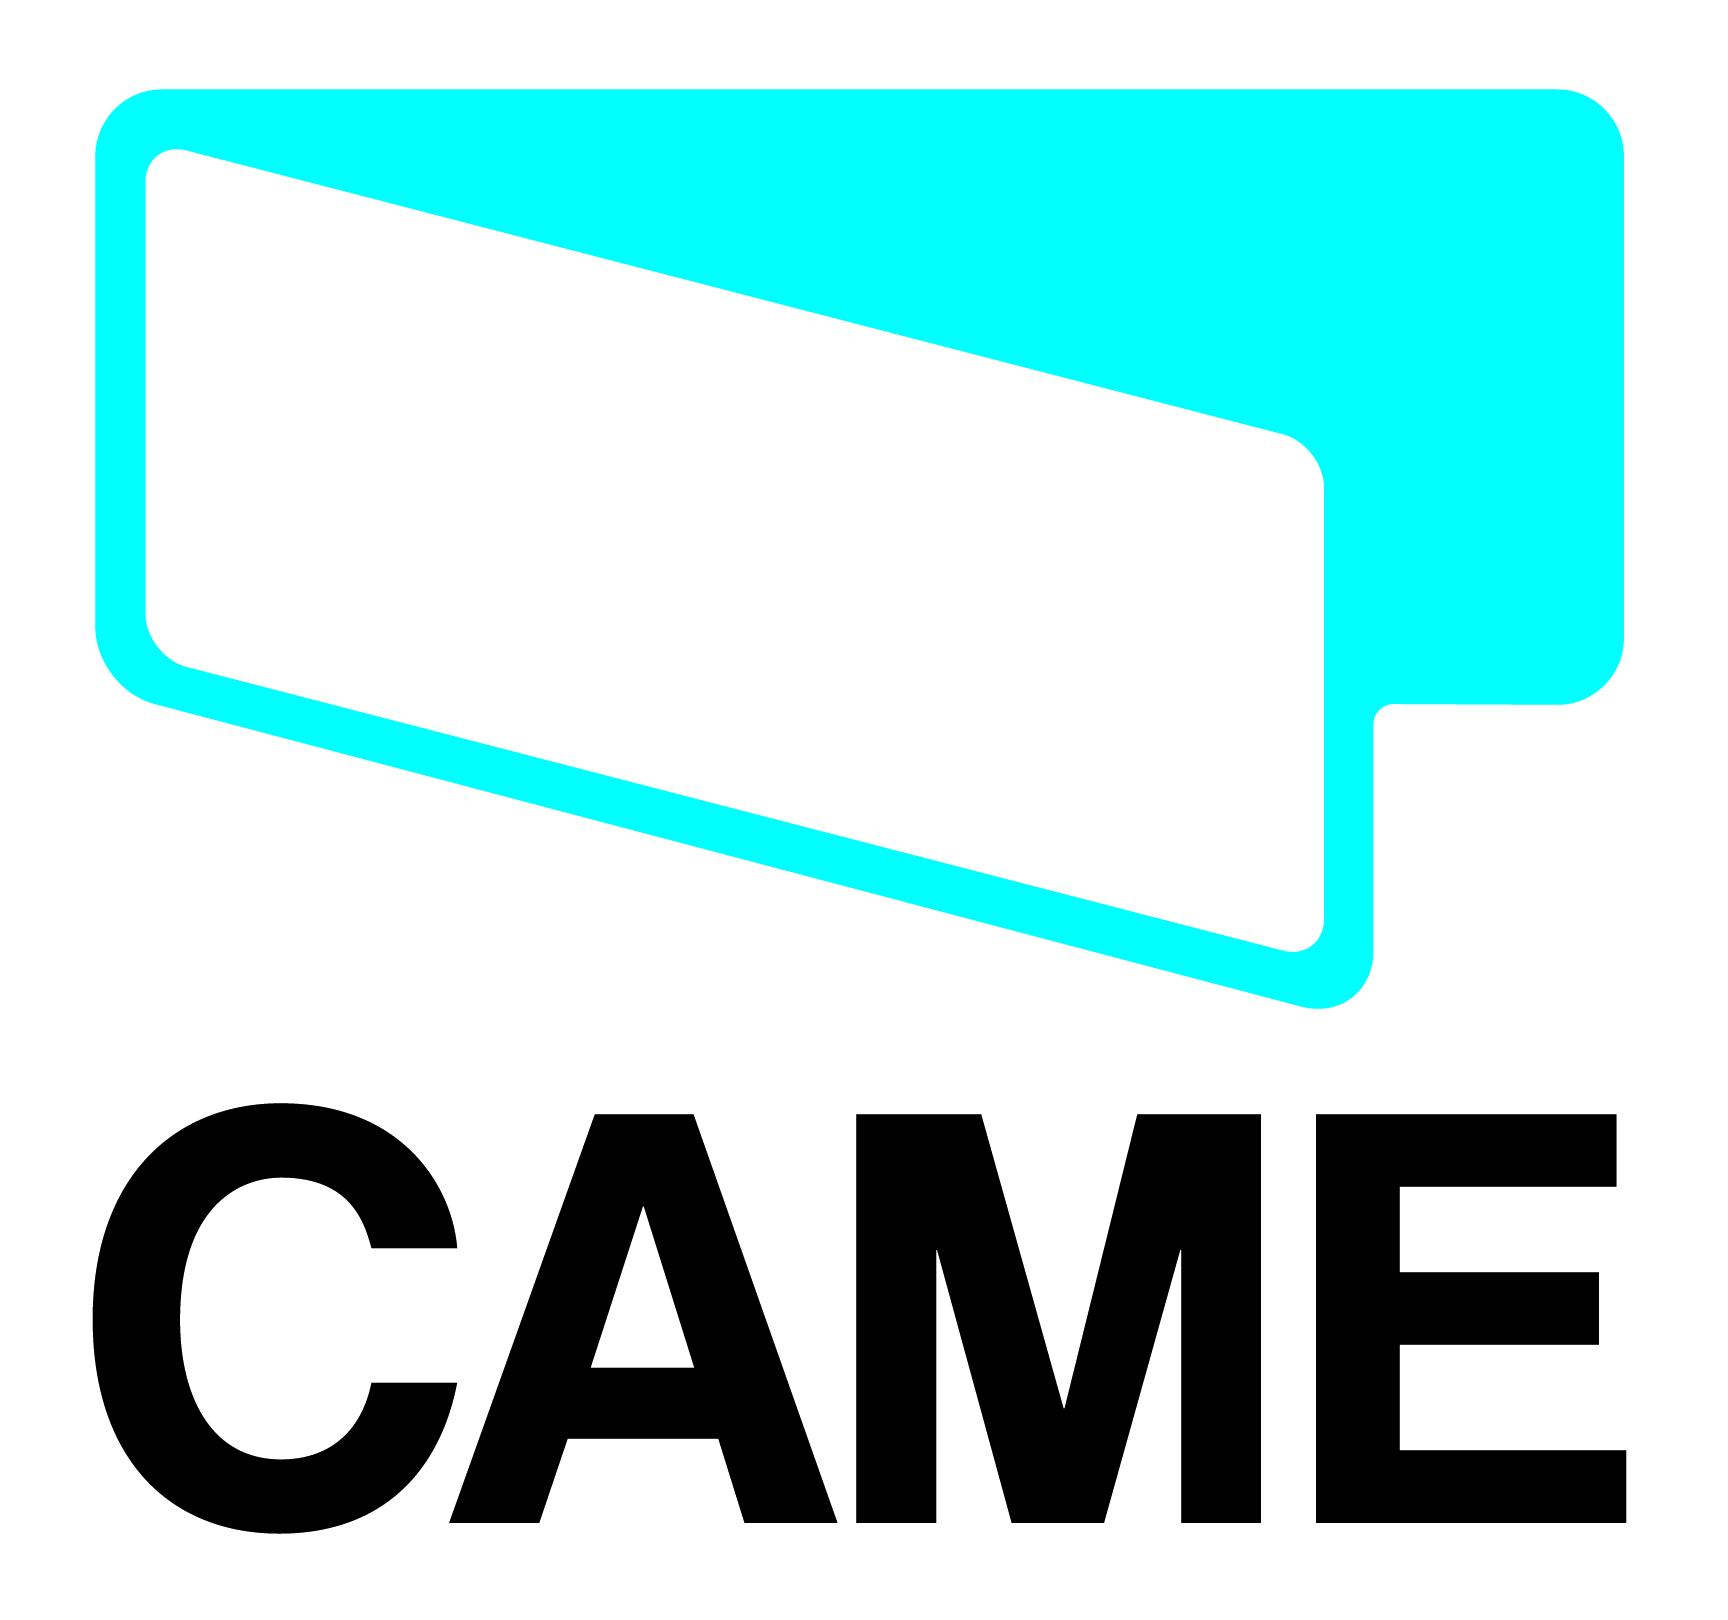 came_logo.jpg